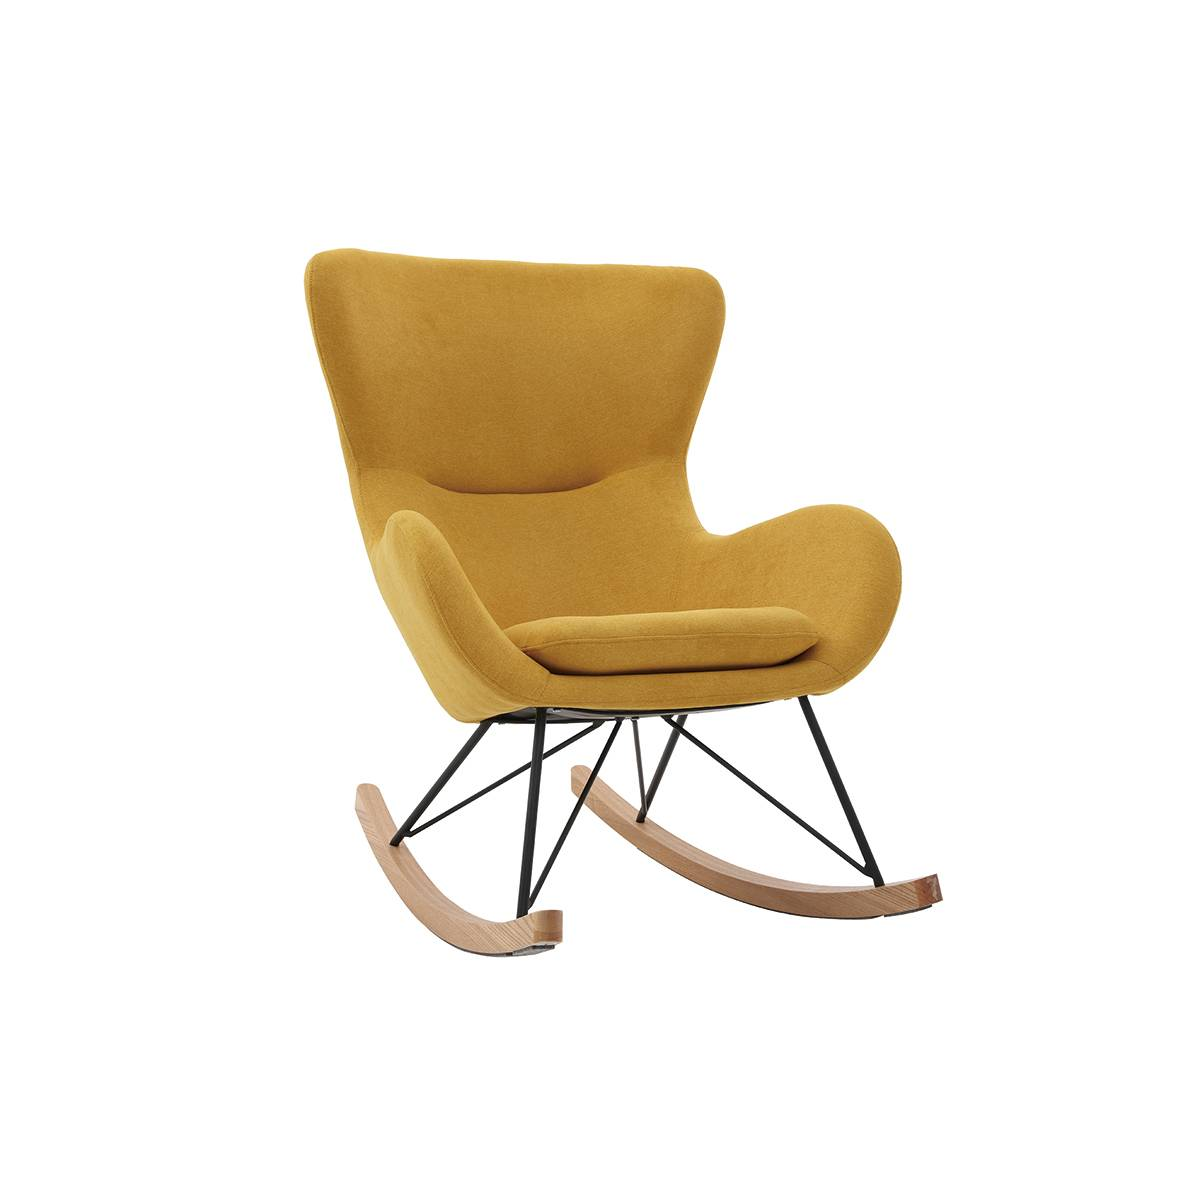 Miliboo Rocking chair design tissu effet velours jaune moutarde ESKUA